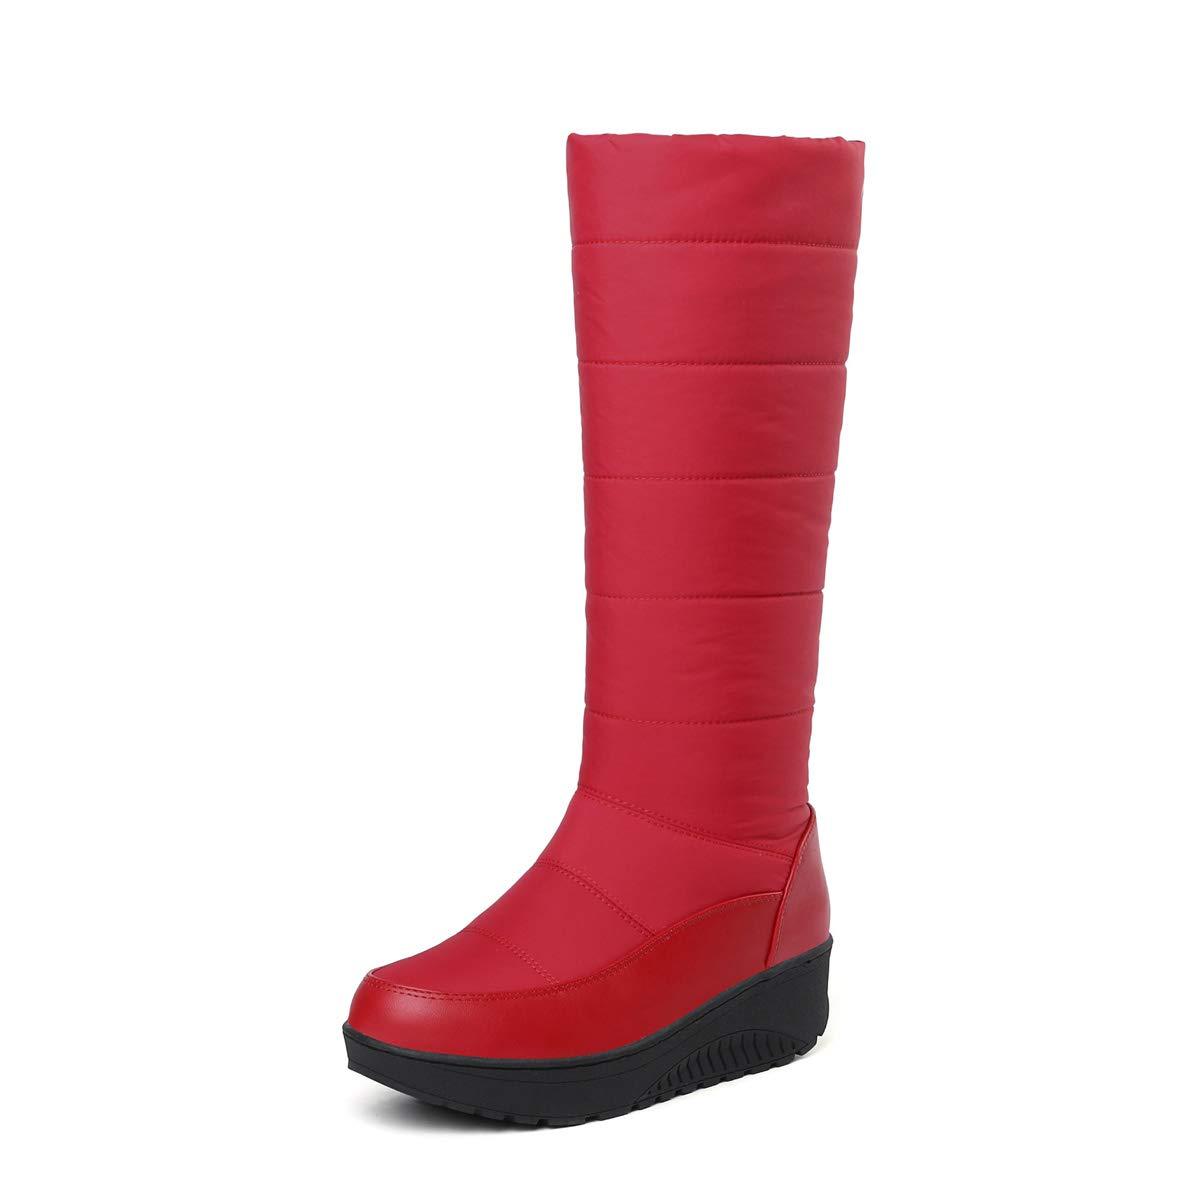 DANDANJIE Schneeschuhe Damen Winter Wasserdichte warme Stiefel Stiefel warme Outdoor Walking Rutschfeste Keilabsatzschuhe (schwarz rot) rot 42EU a84323